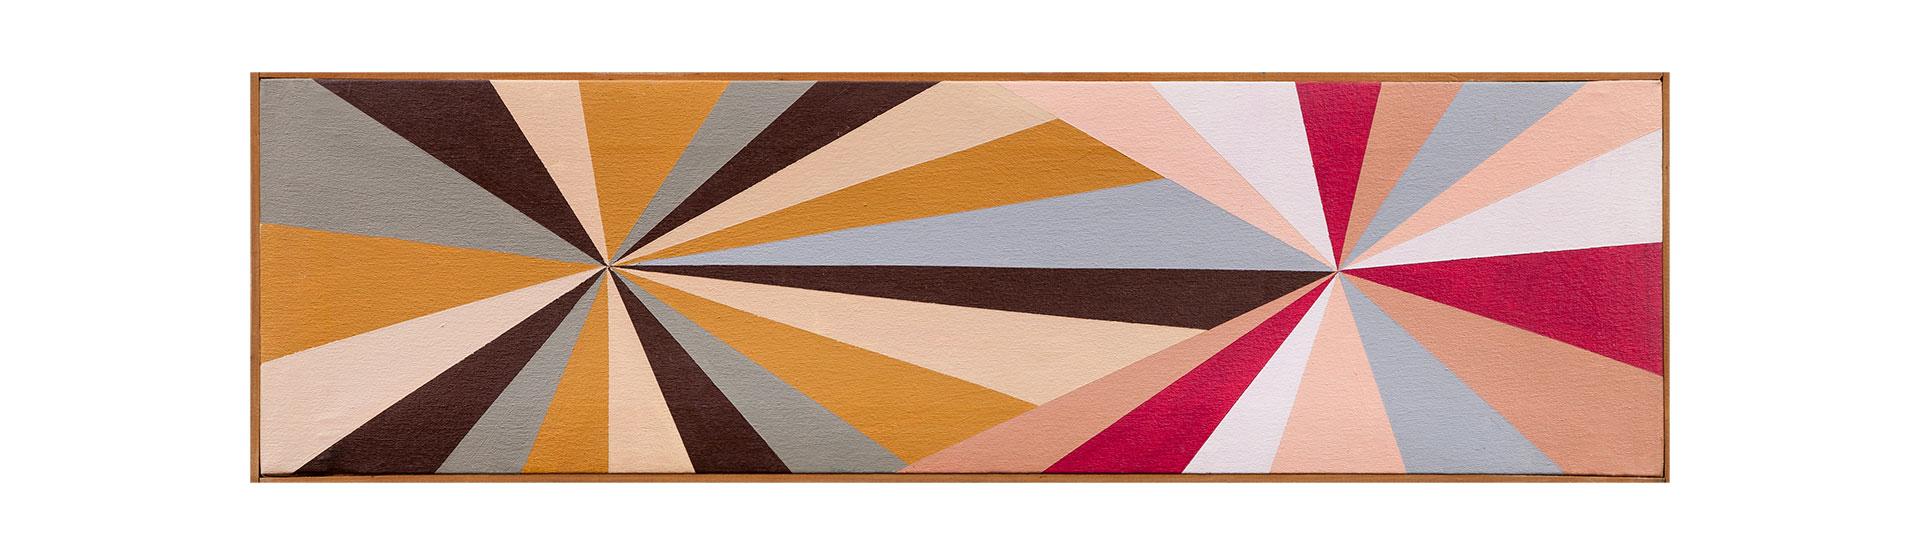 Laguna, Fernanda. Rayos 5 (1995) Acrílico S_ Tela 21 X73 cm